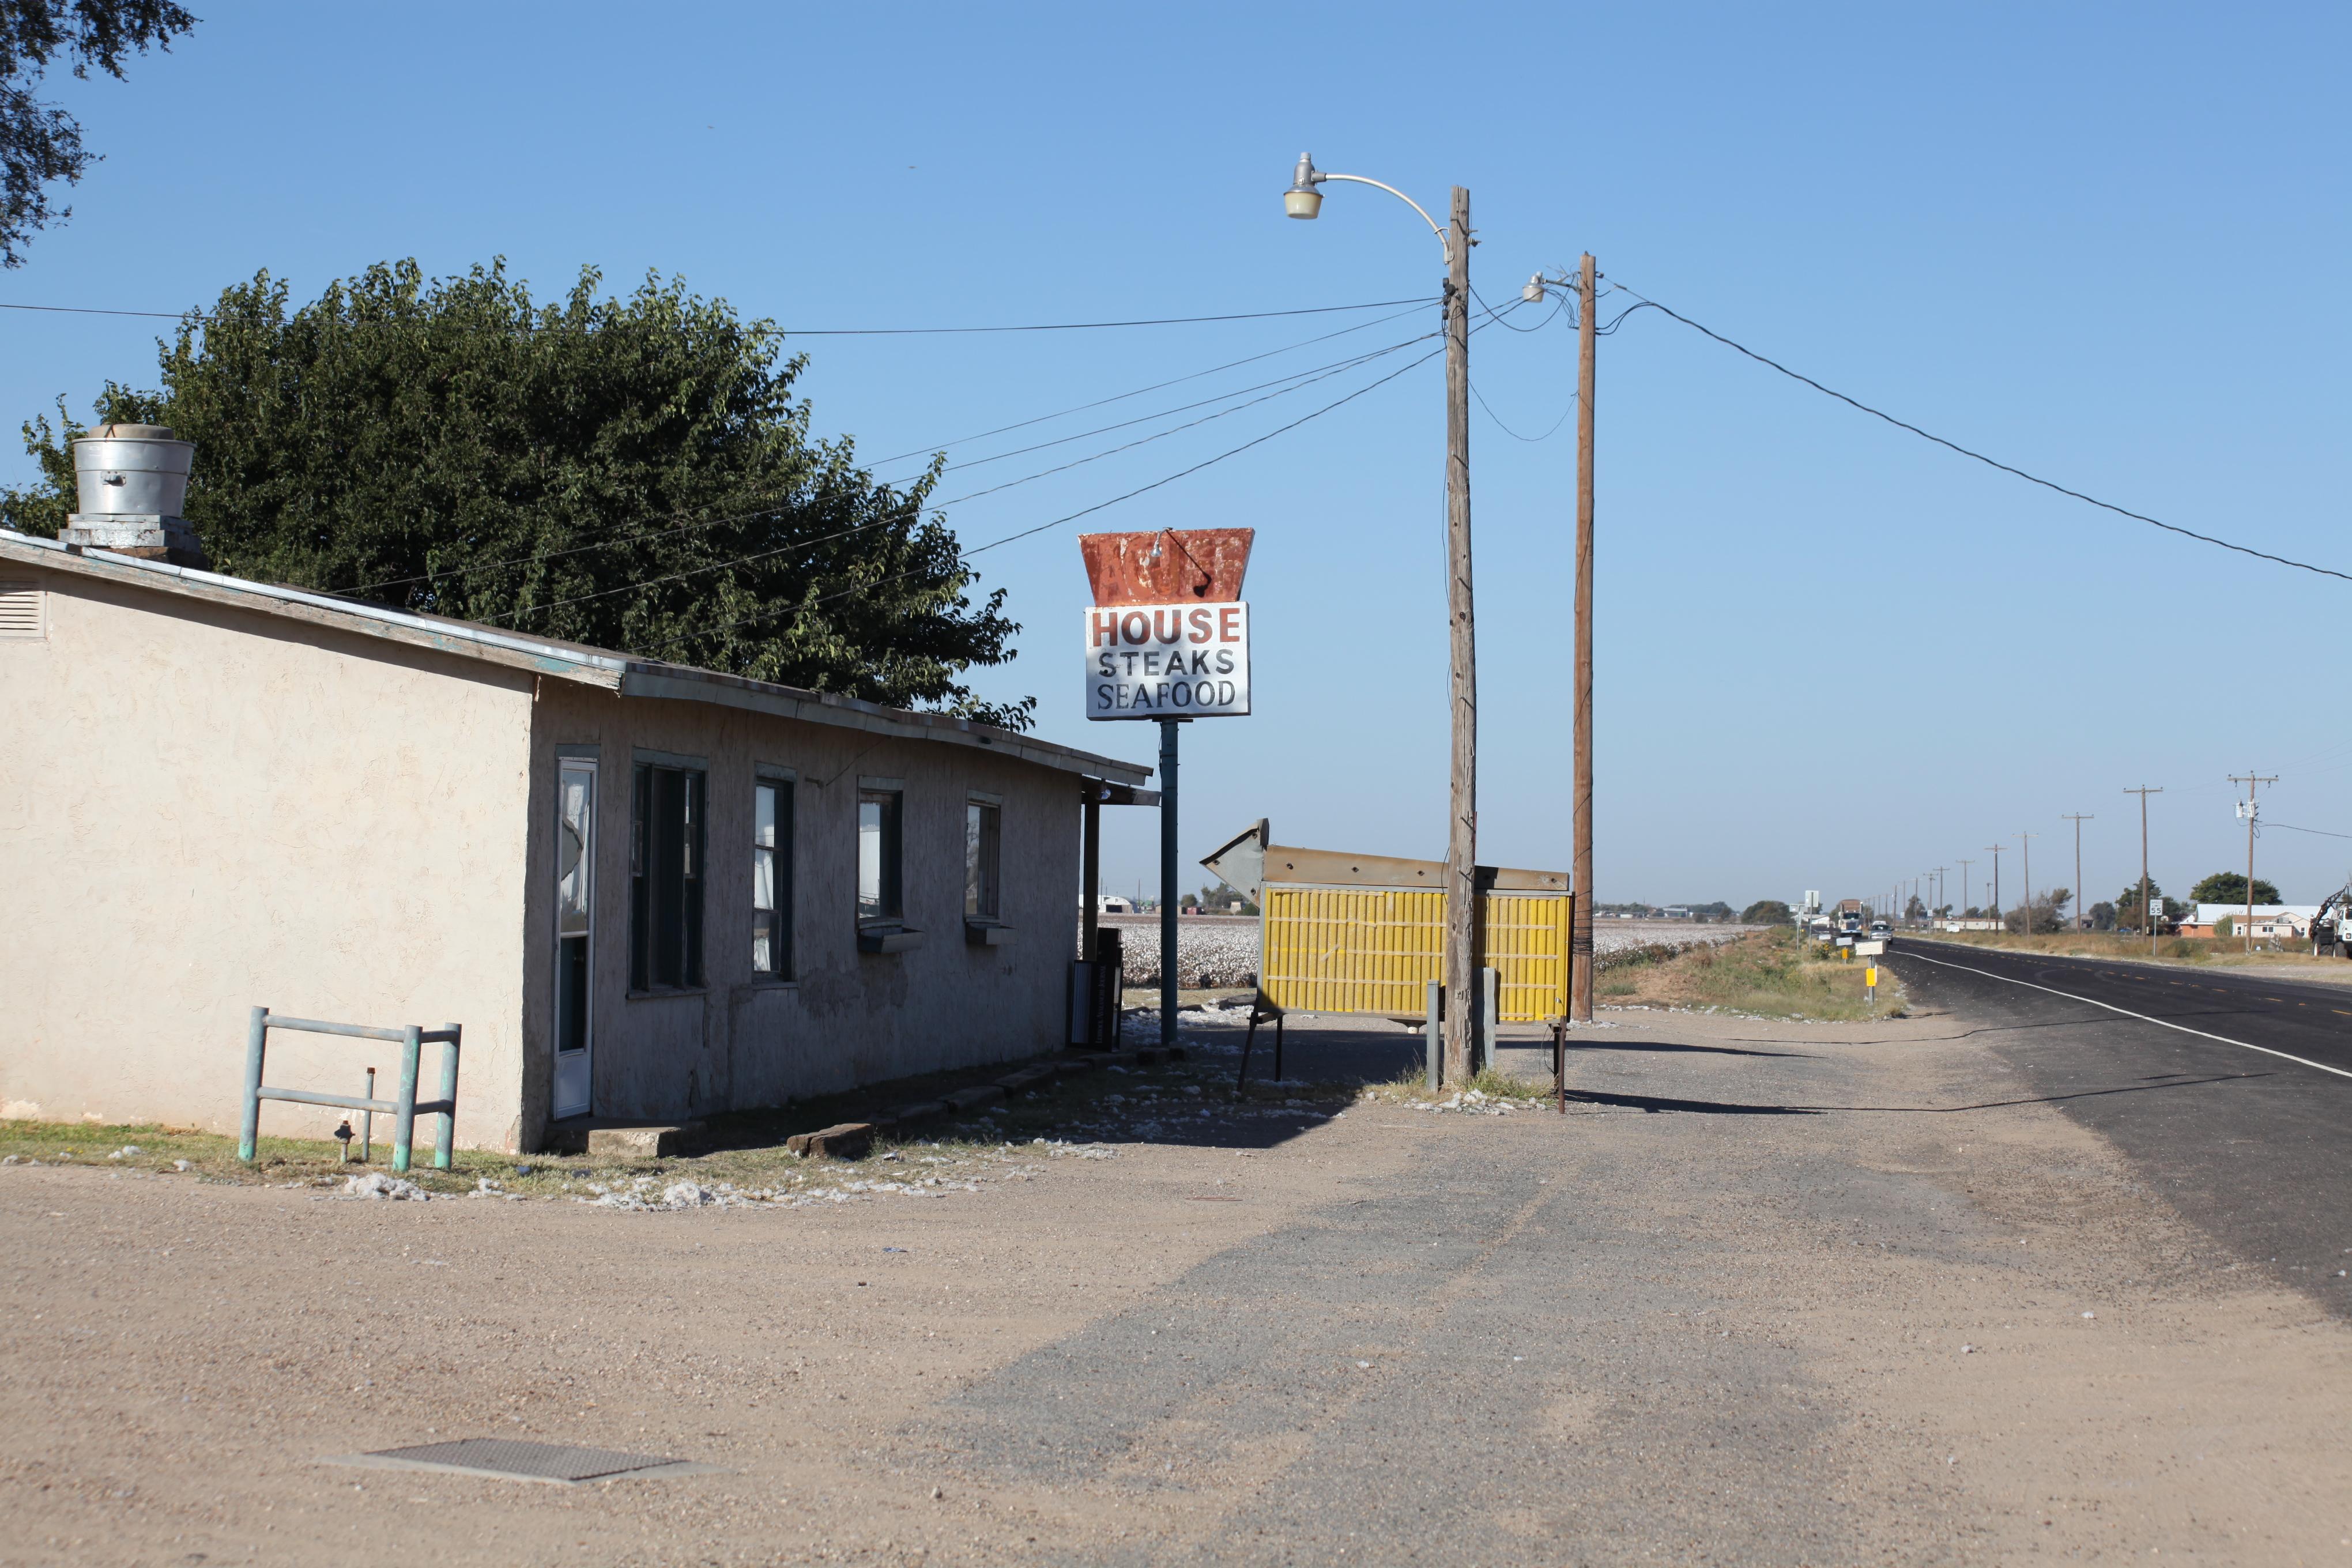 Acuff_Steakhouse_Texas_2010.JPG